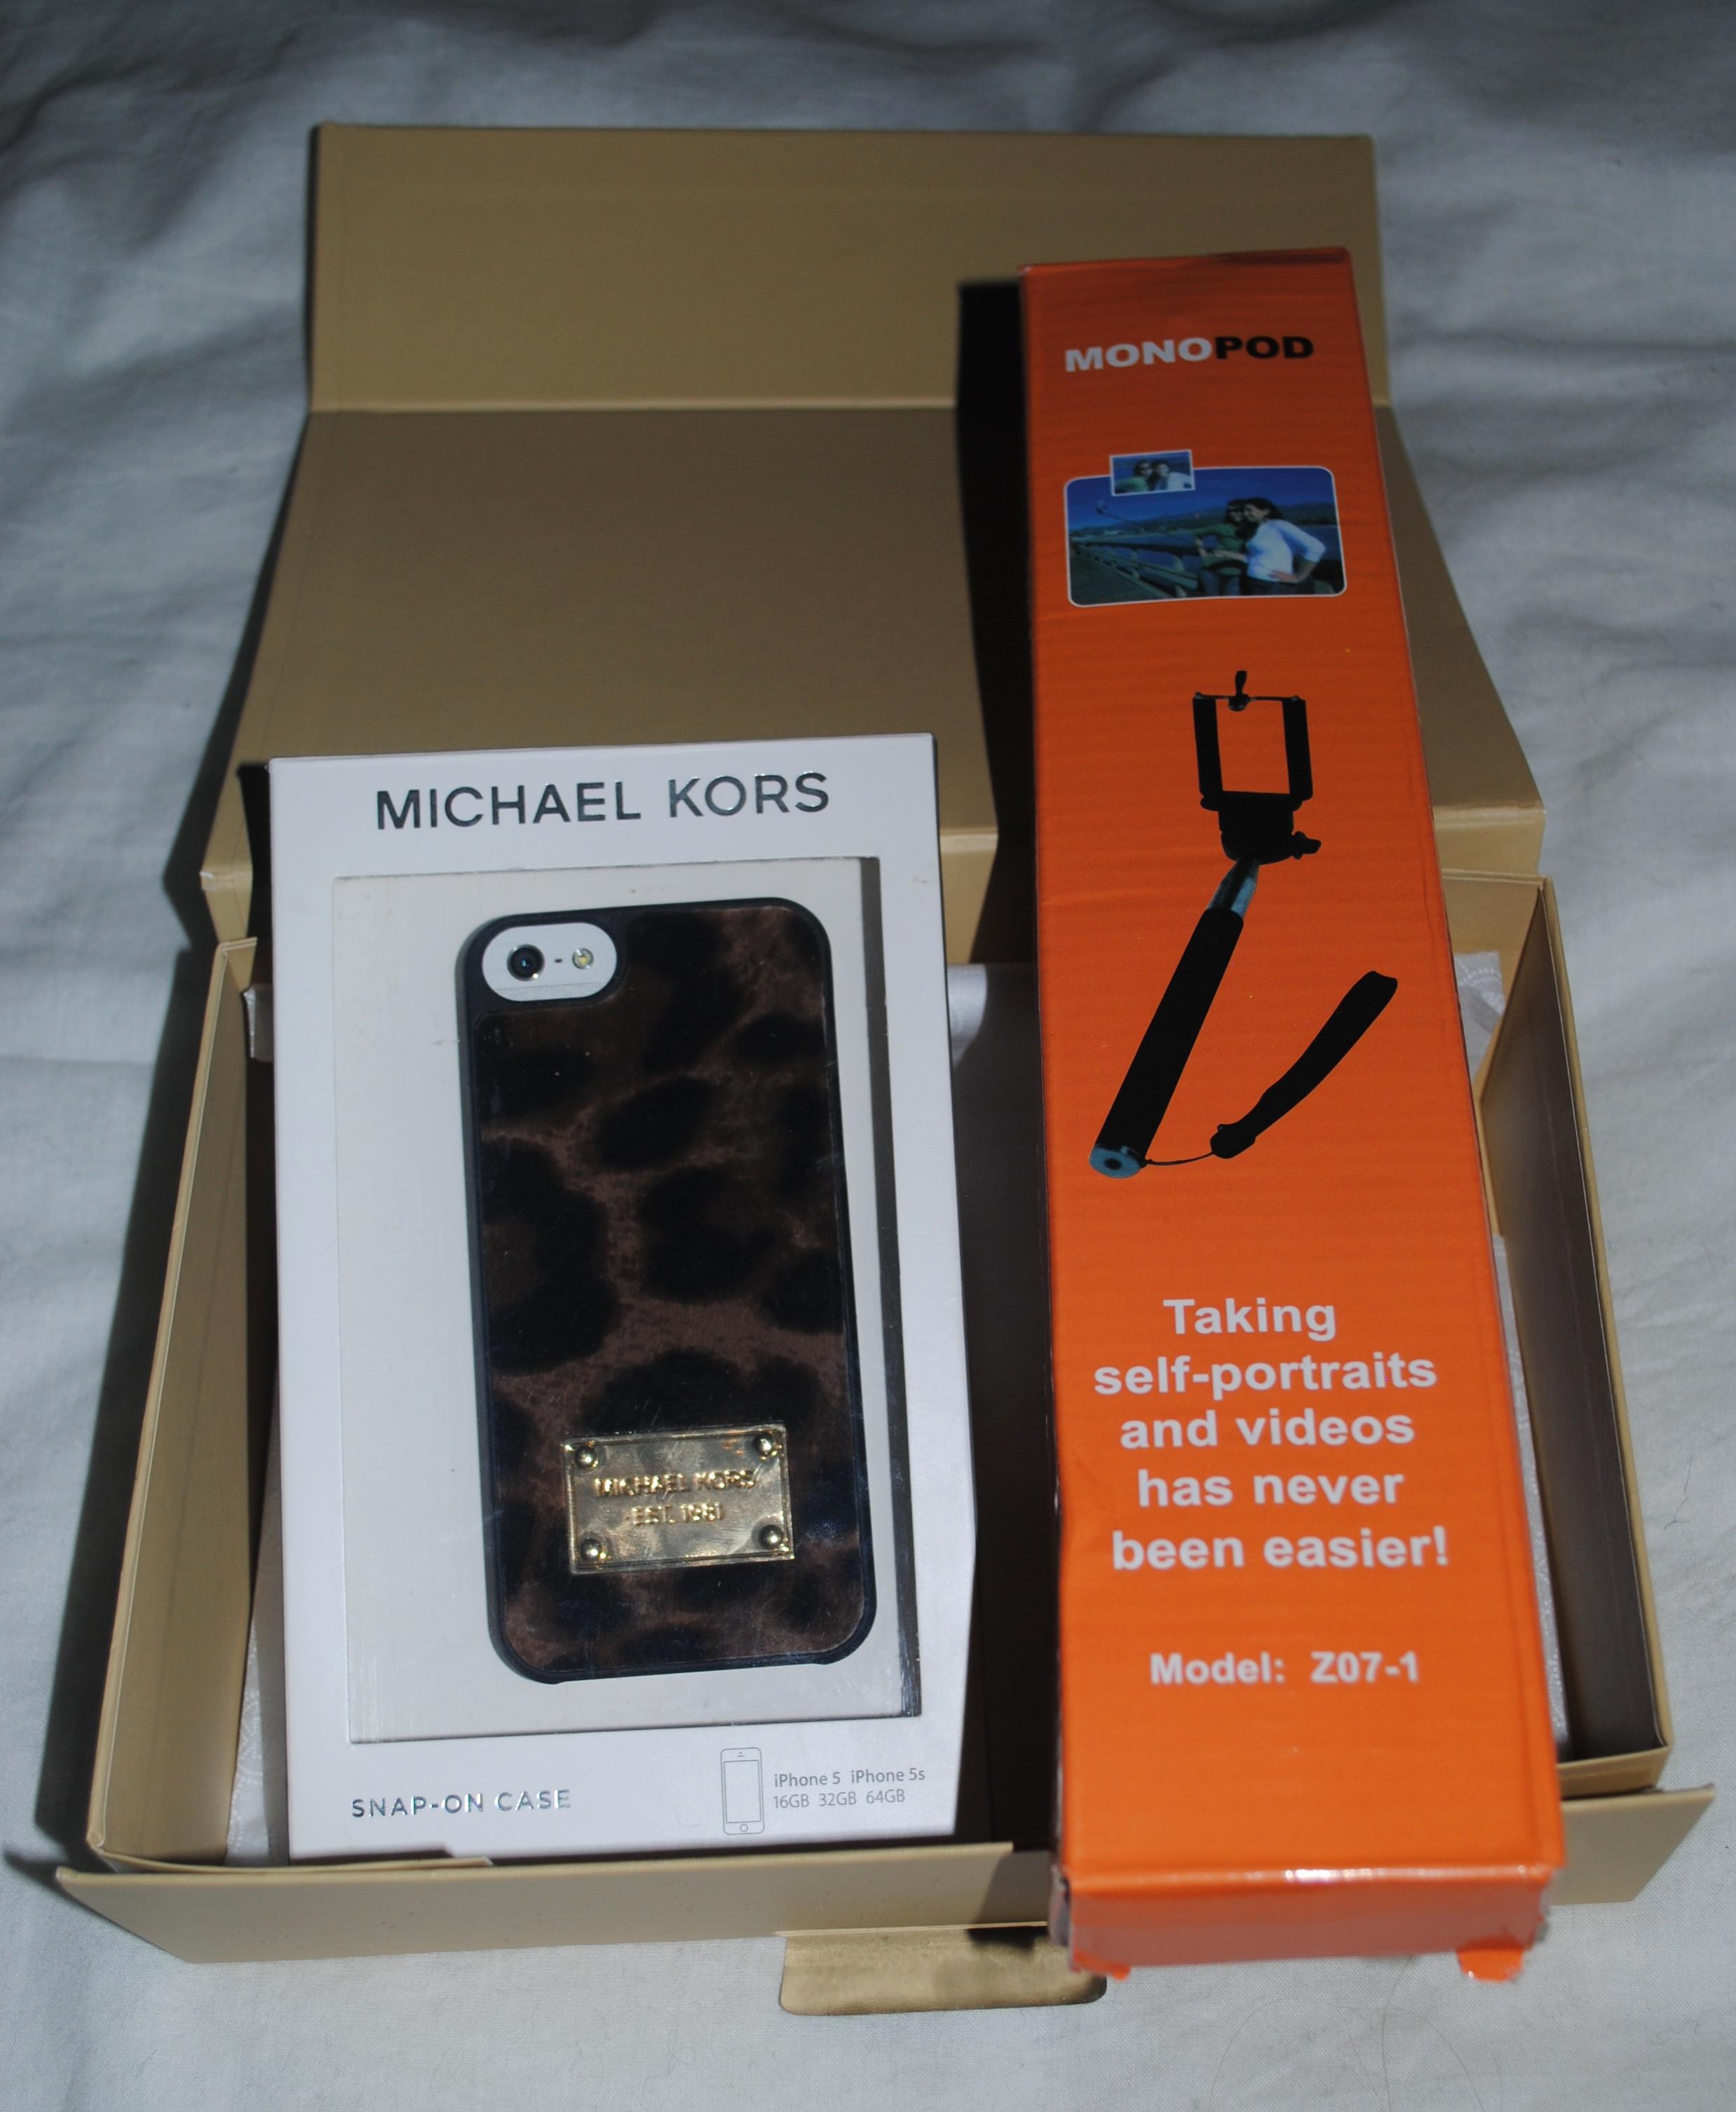 iphone selfie stick